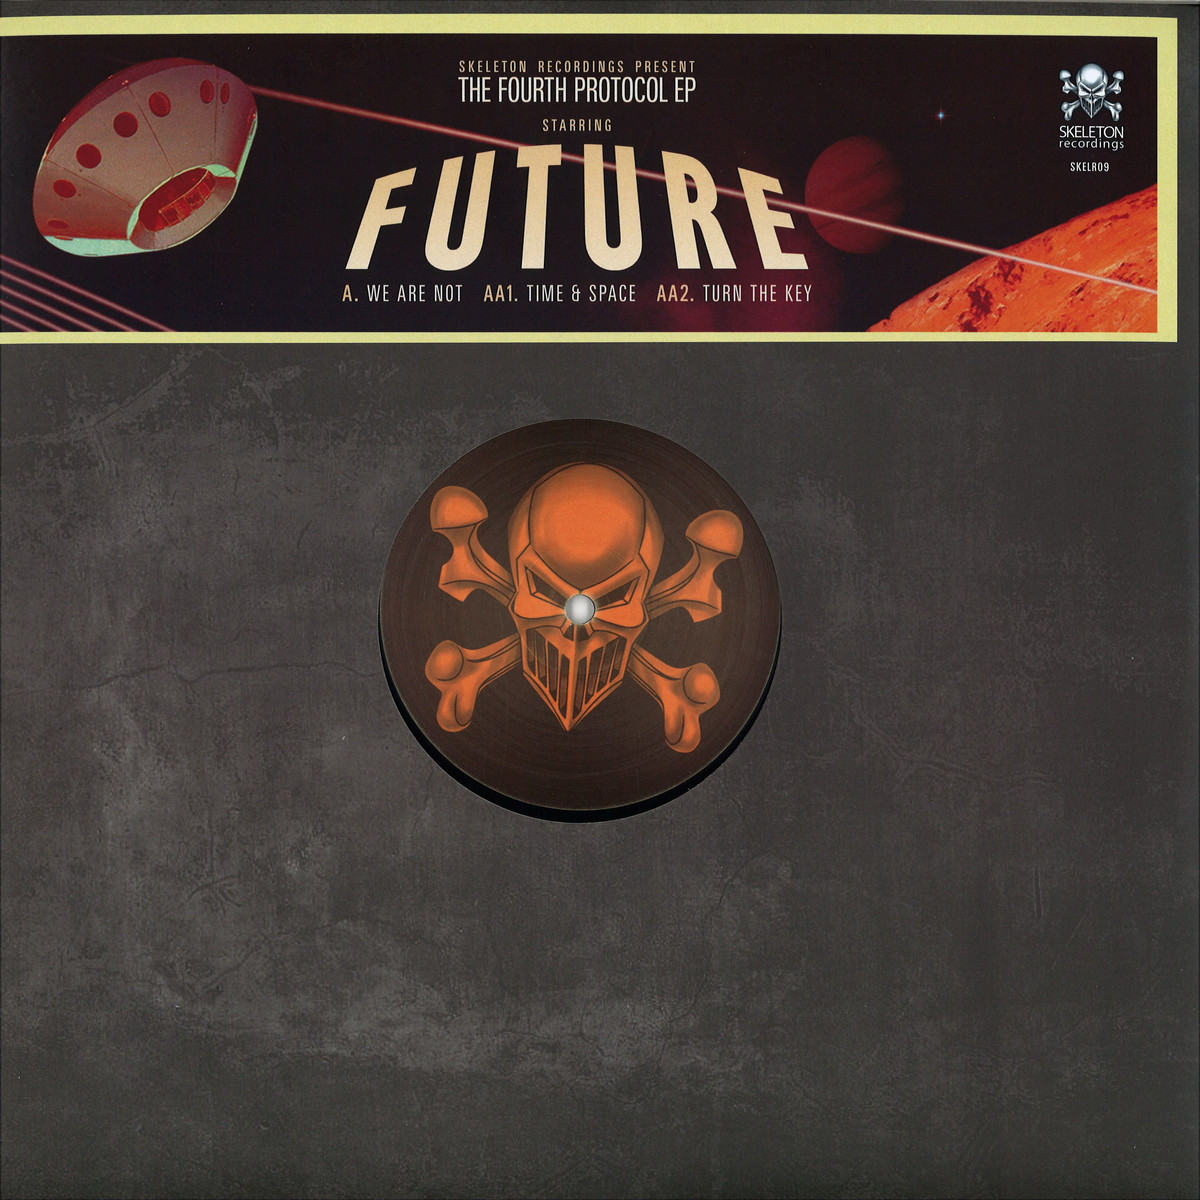 deejay de - Skeleton Recordings